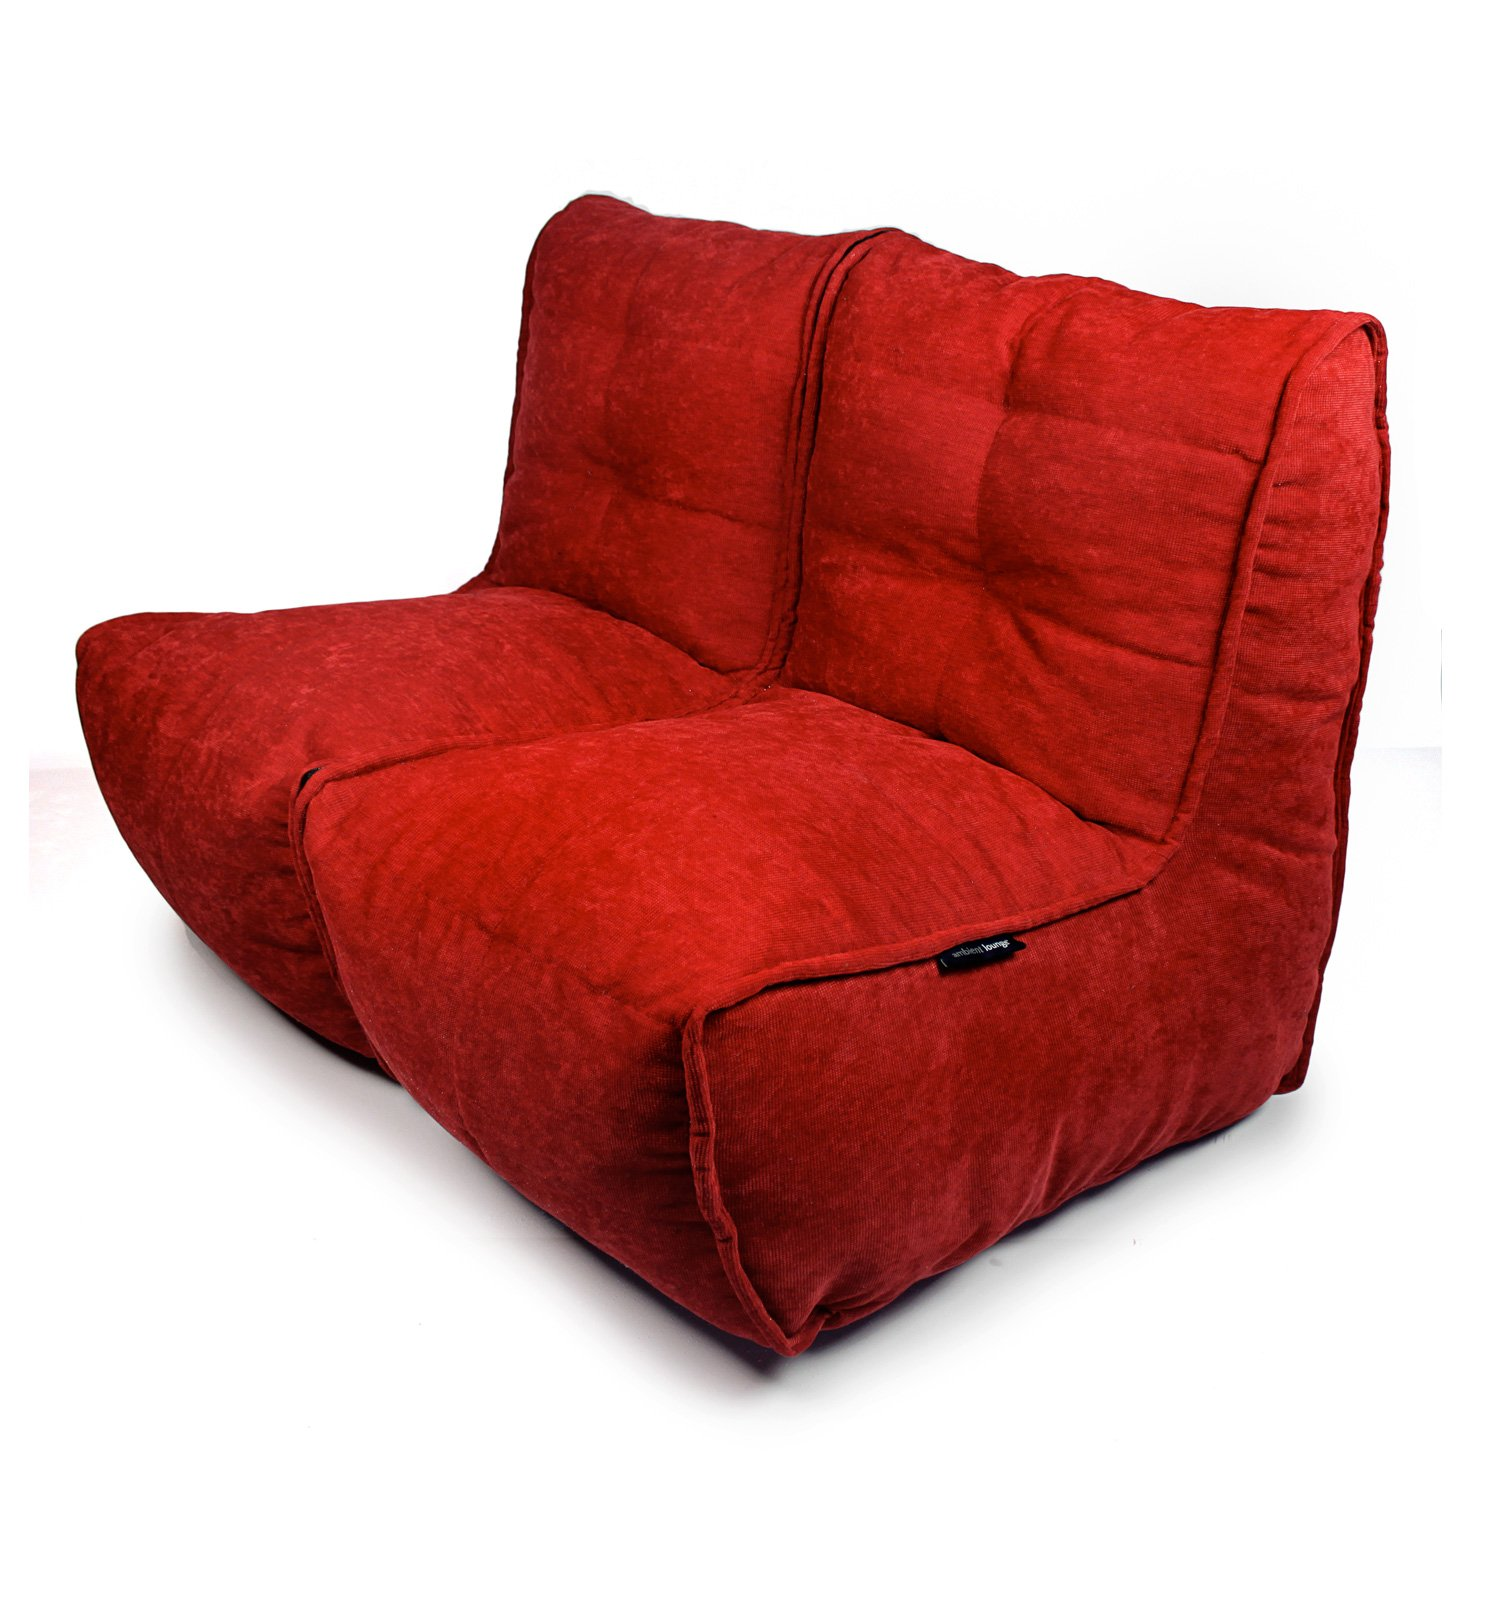 Full Size of Sitzsack Sofa Twin Wildberry Red Ambientyou Grau Stoff Esszimmer Großes U Form Kunstleder Big Günstig Halbrund Hussen Ohne Lehne Für Schilling Günstige Sofa Sitzsack Sofa